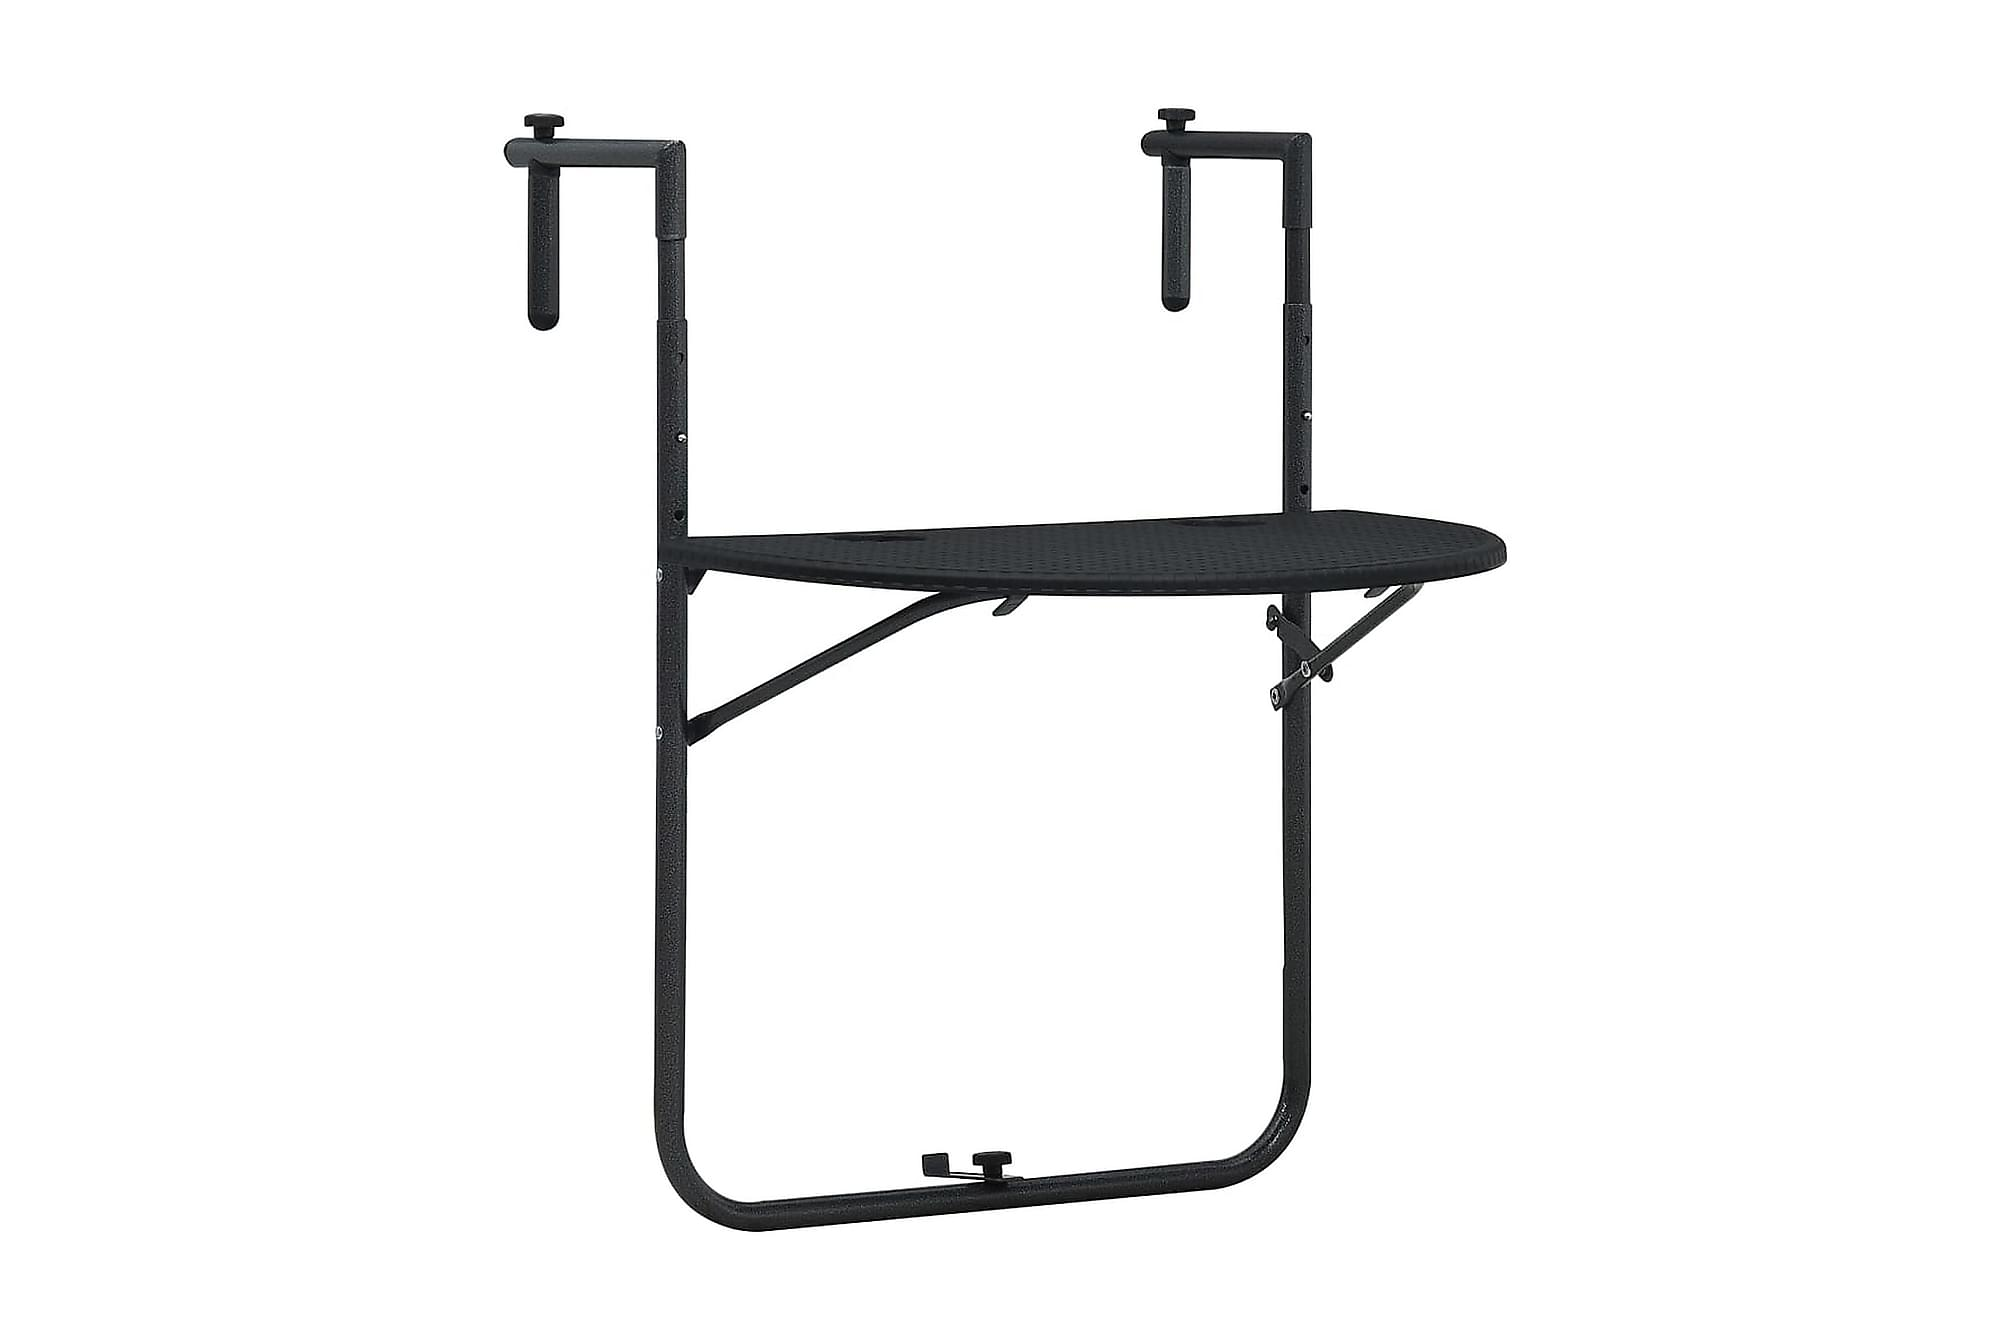 Balkongbord svart 60x64x83,5 cm plast konstrotting